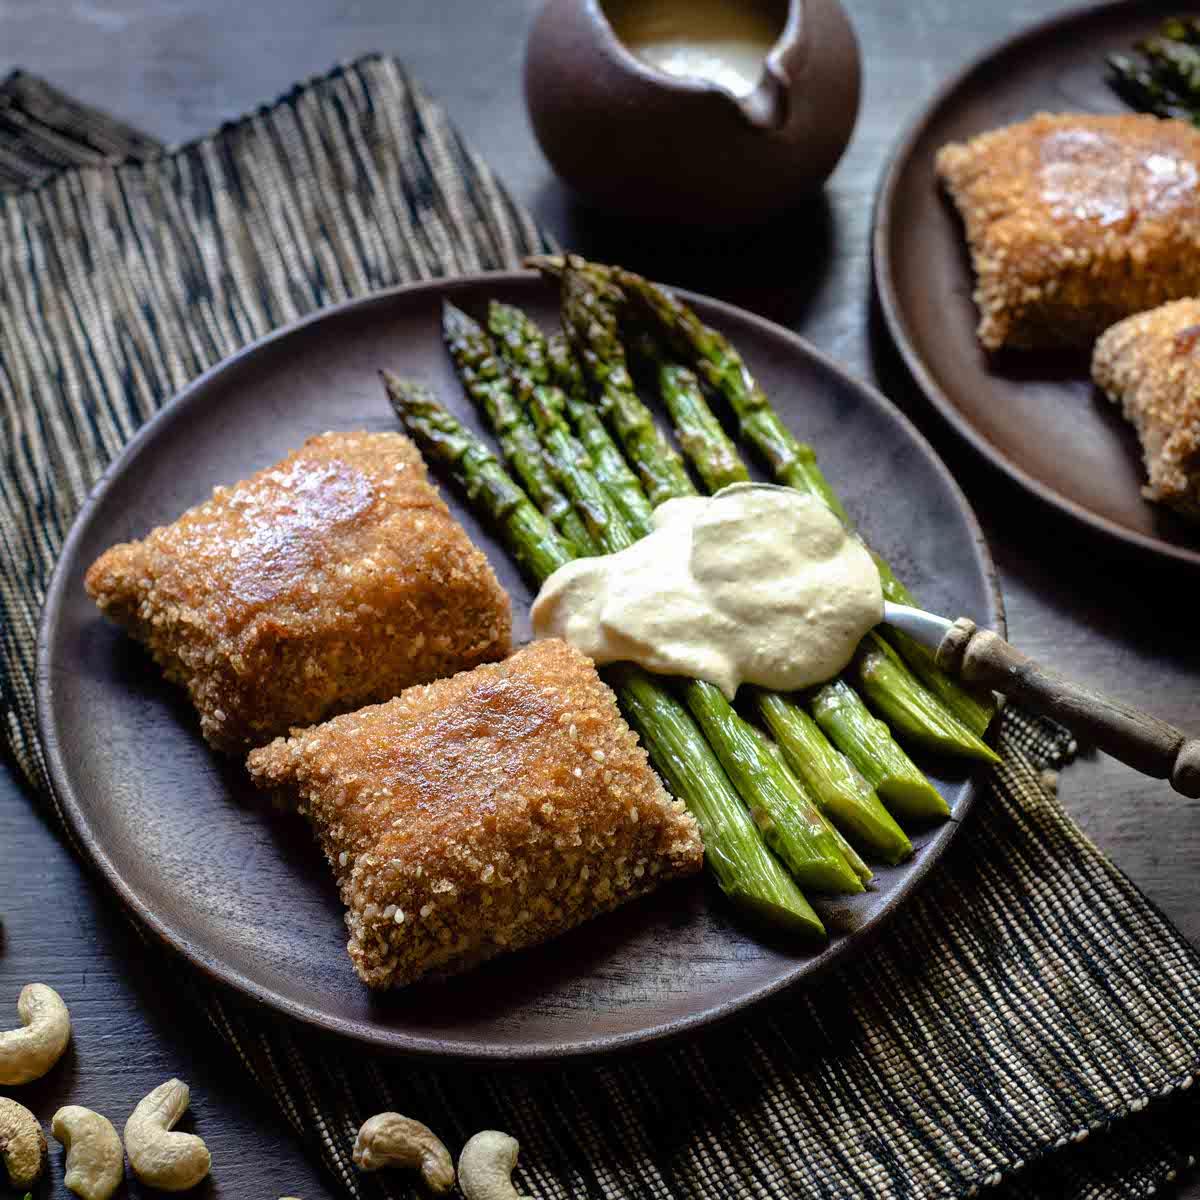 Cordon Bleu με Ψητά Σπαράγγια και Σάλτσα από Κάσιους